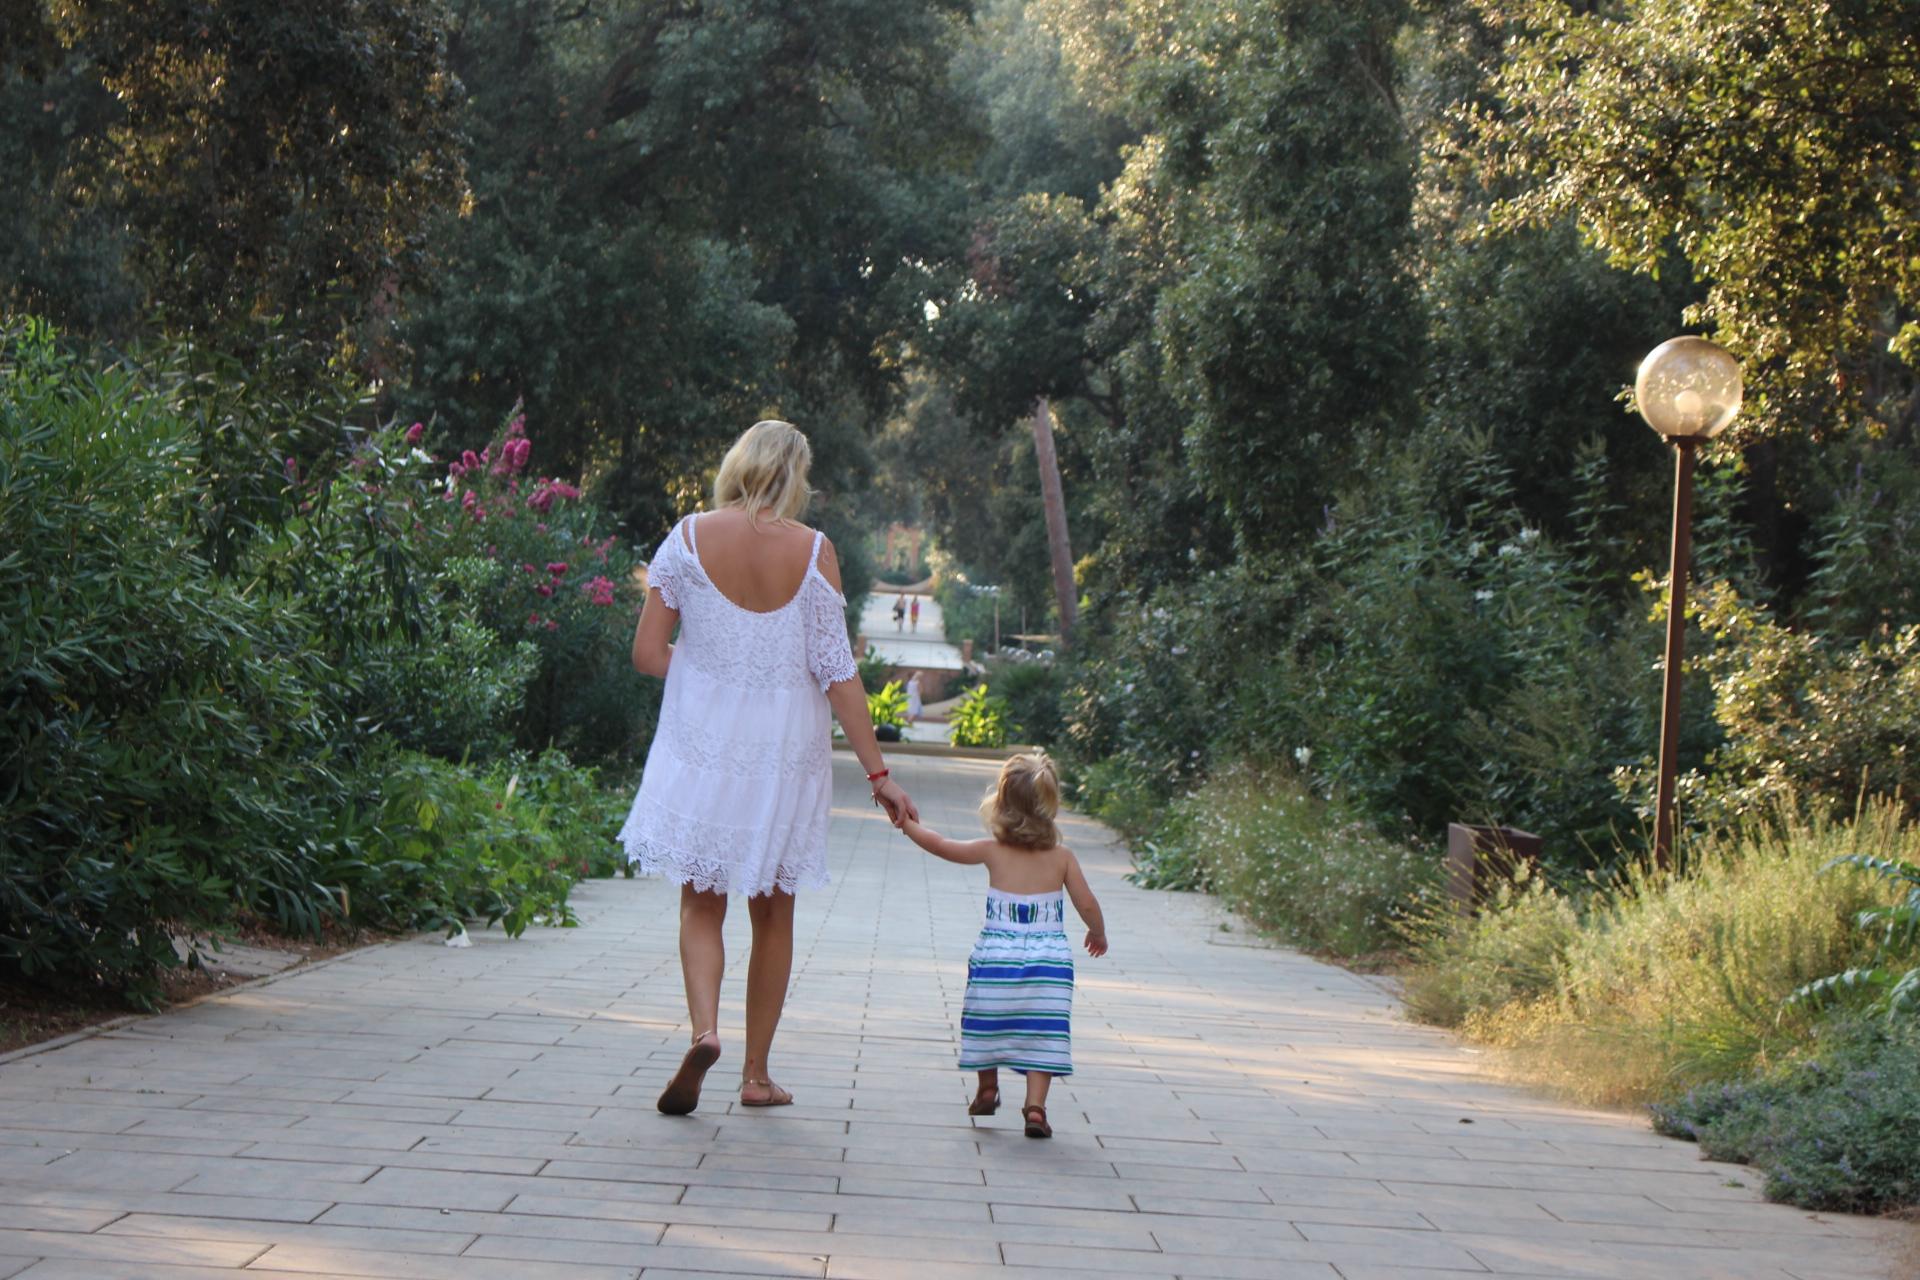 Child enhance travel experience